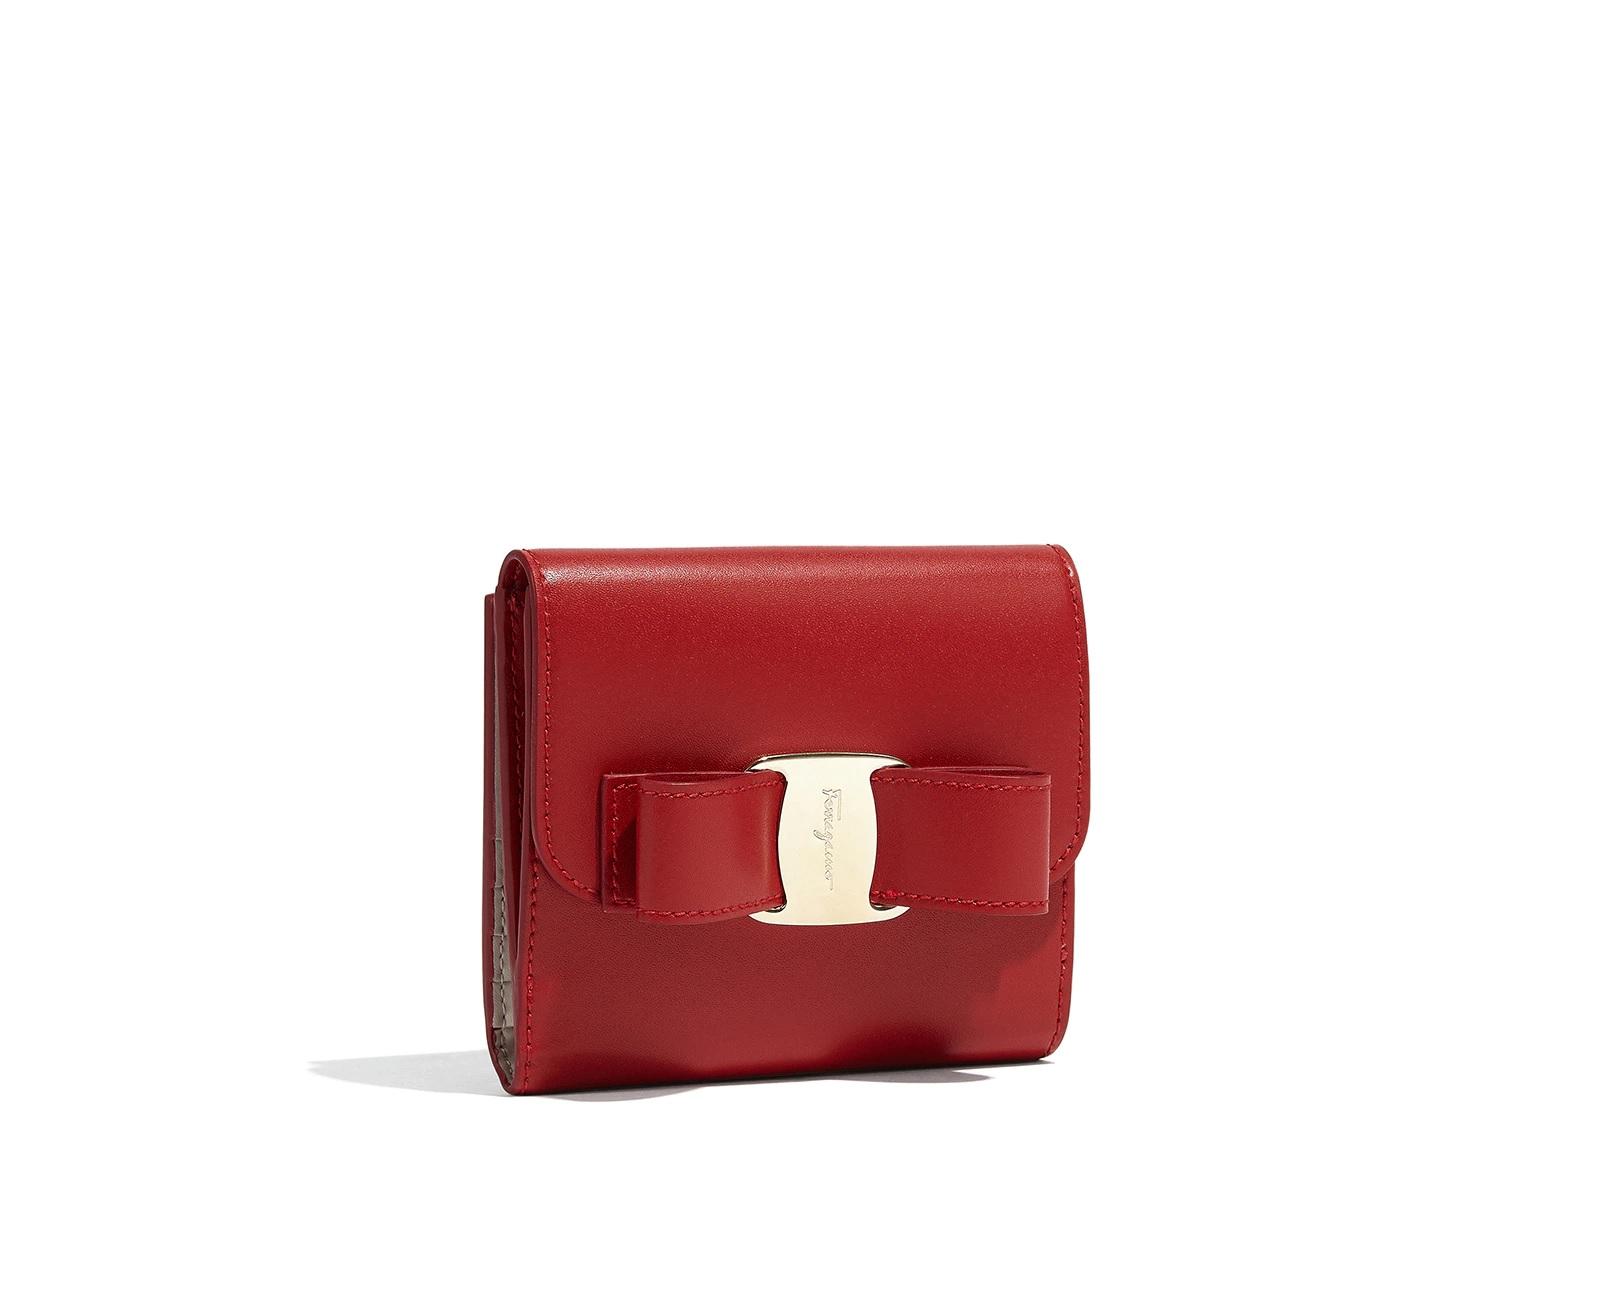 Salvatore Ferragamo(サルヴァトーレ フェラガモ) ヴァラ二つ折り財布